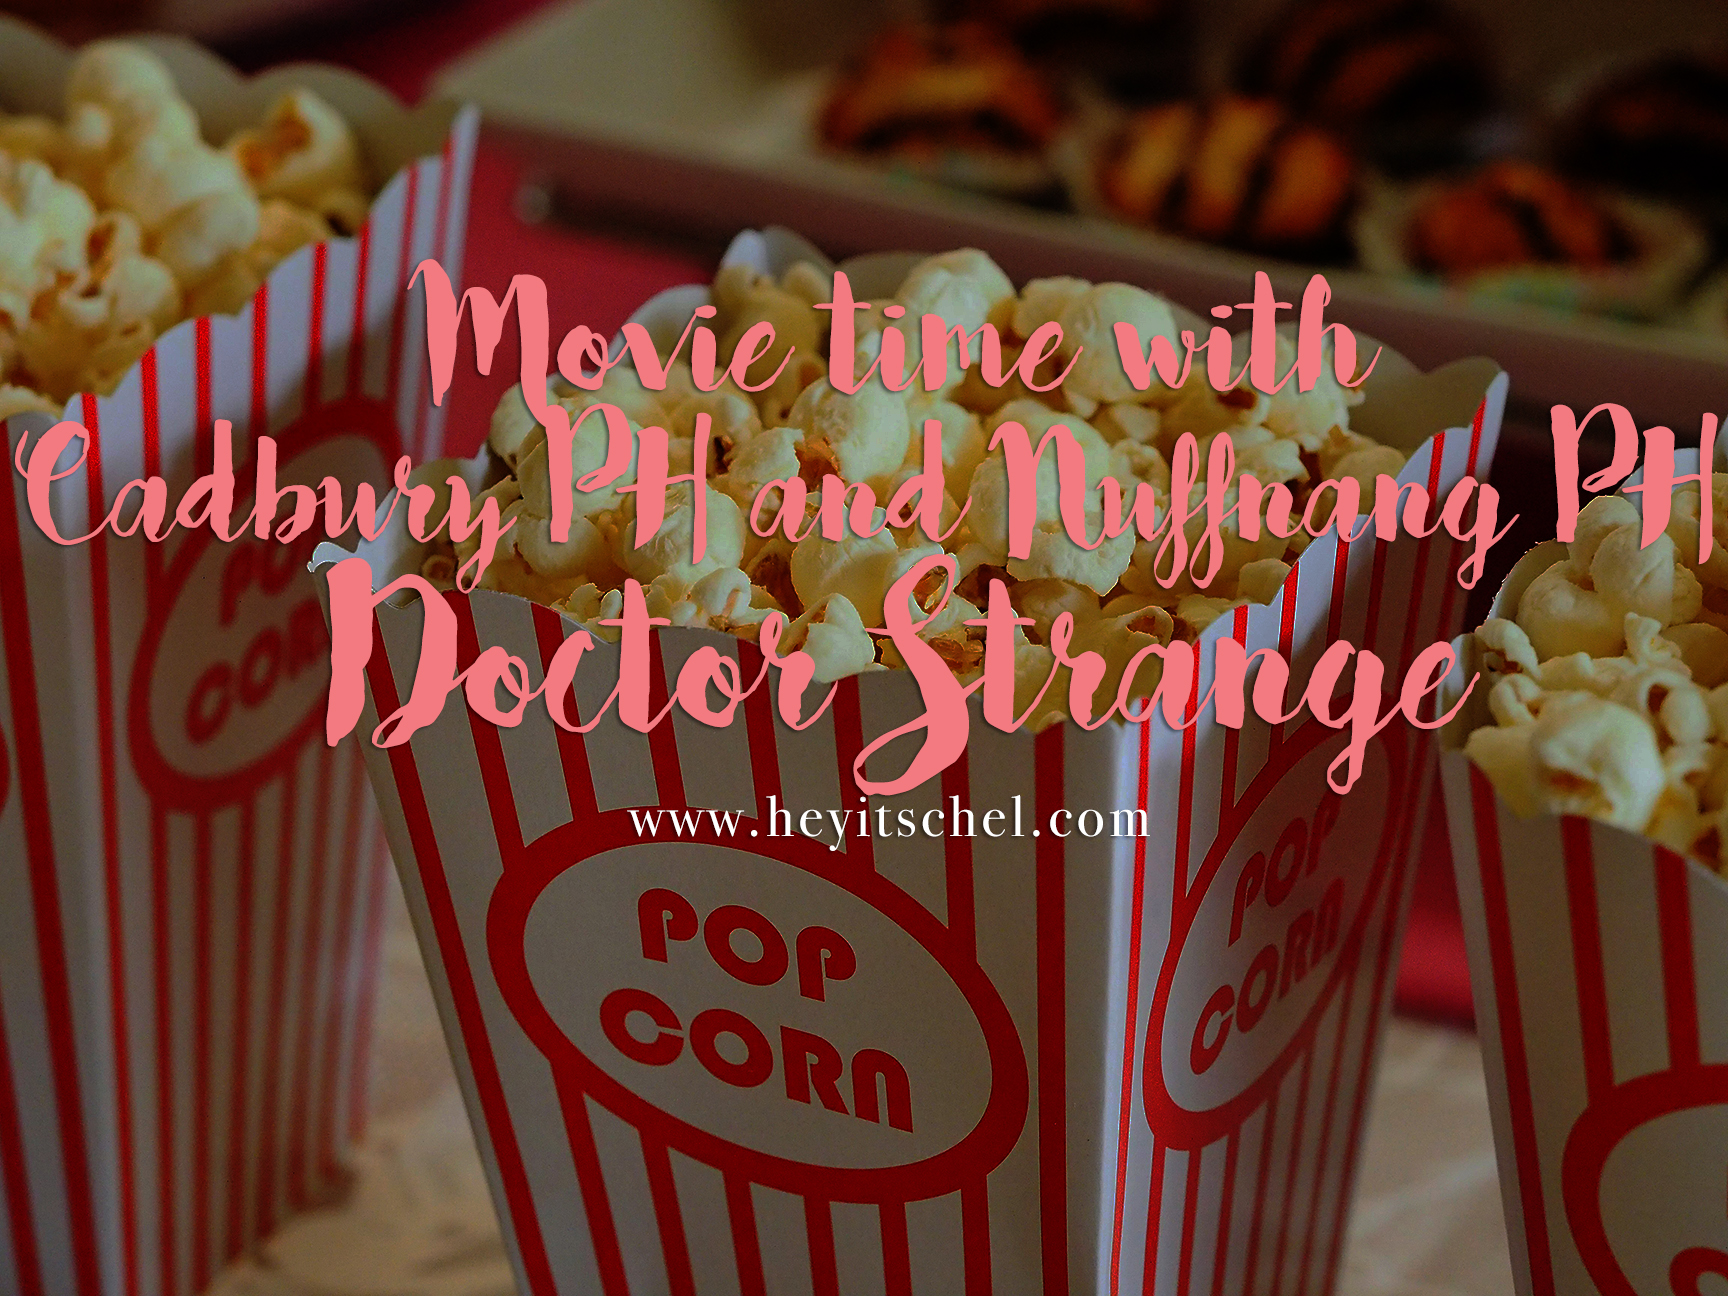 Movie time with Cadbury PH and Nuffnang PH: Doctor Strange